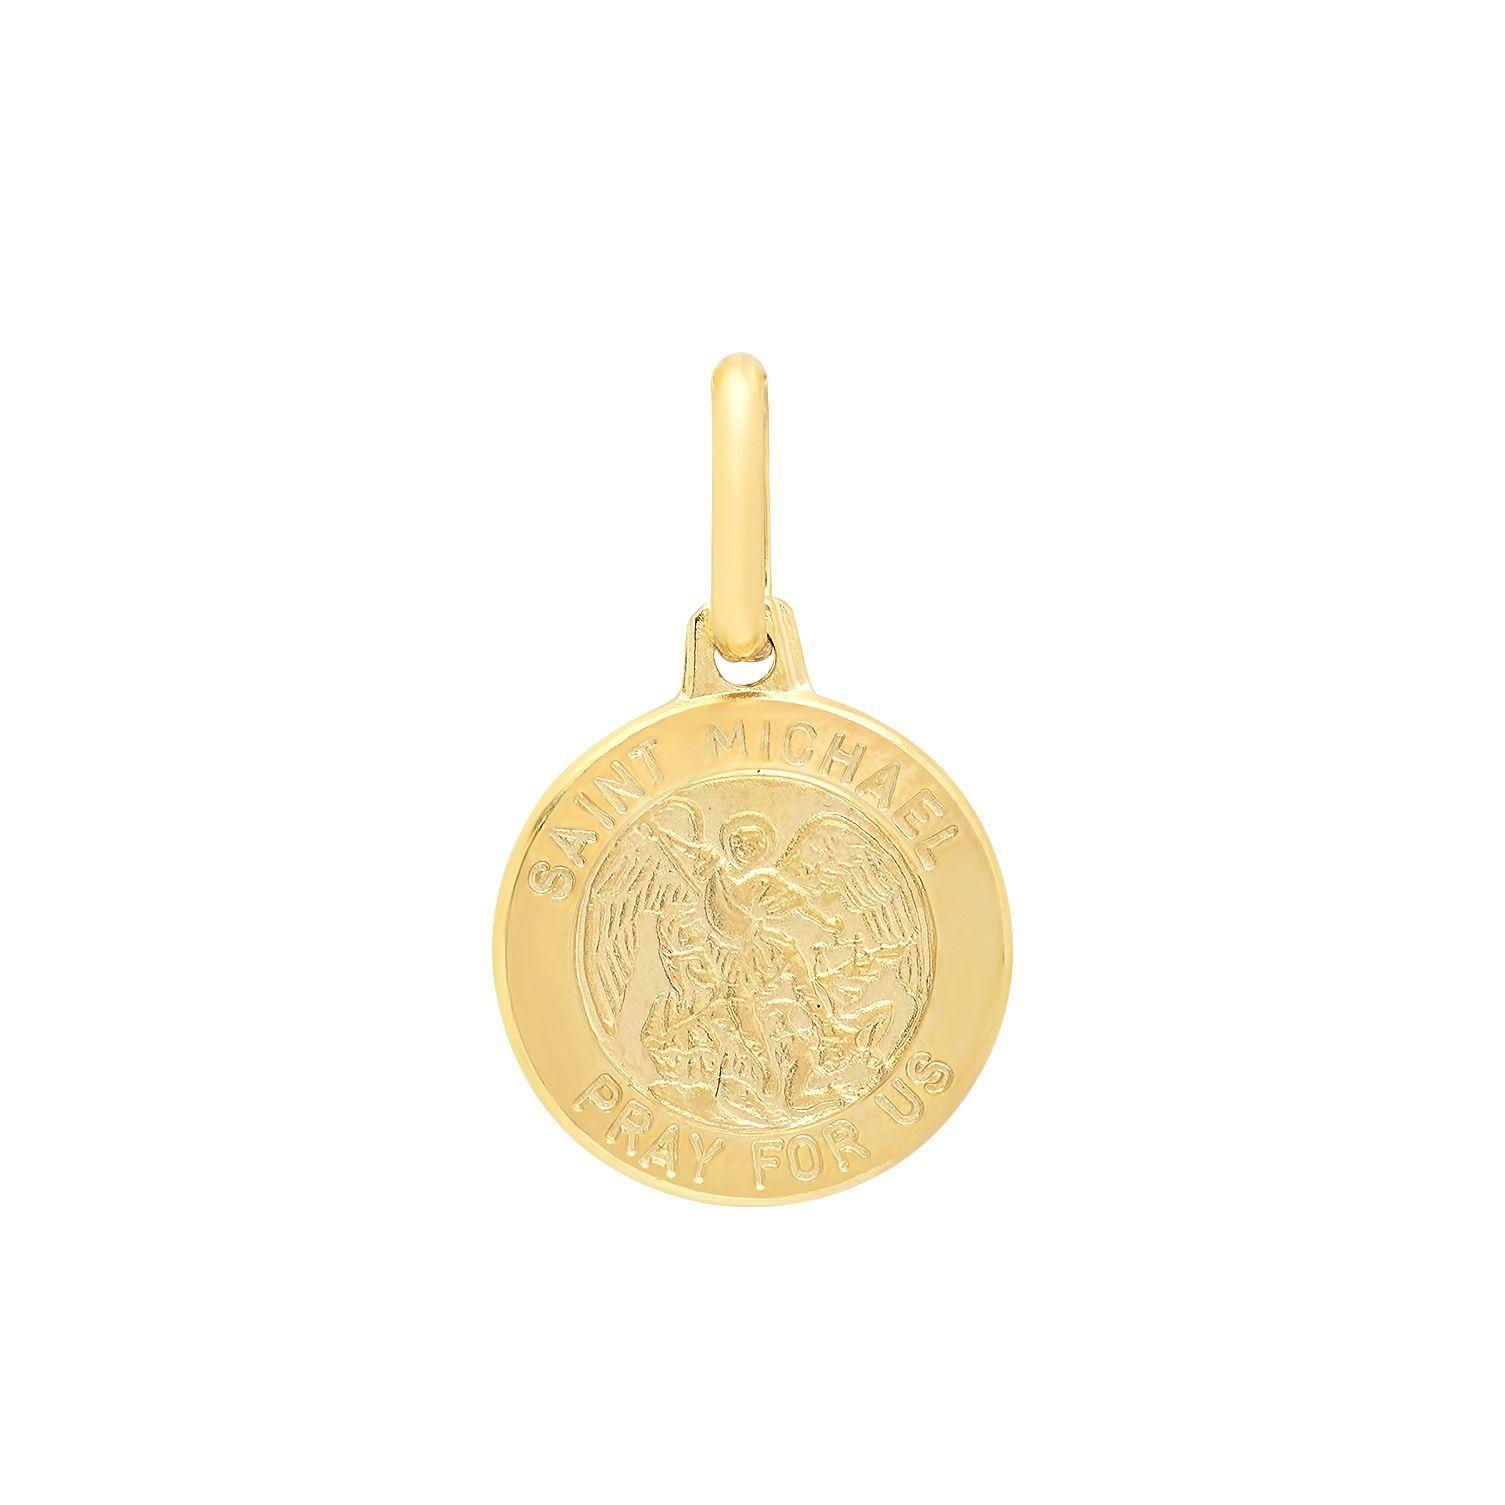 Sterling essentials italian 14k gold mm stmichael medal pendant sterling essentials italian 14k gold mm stmichael medal pendant aloadofball Images